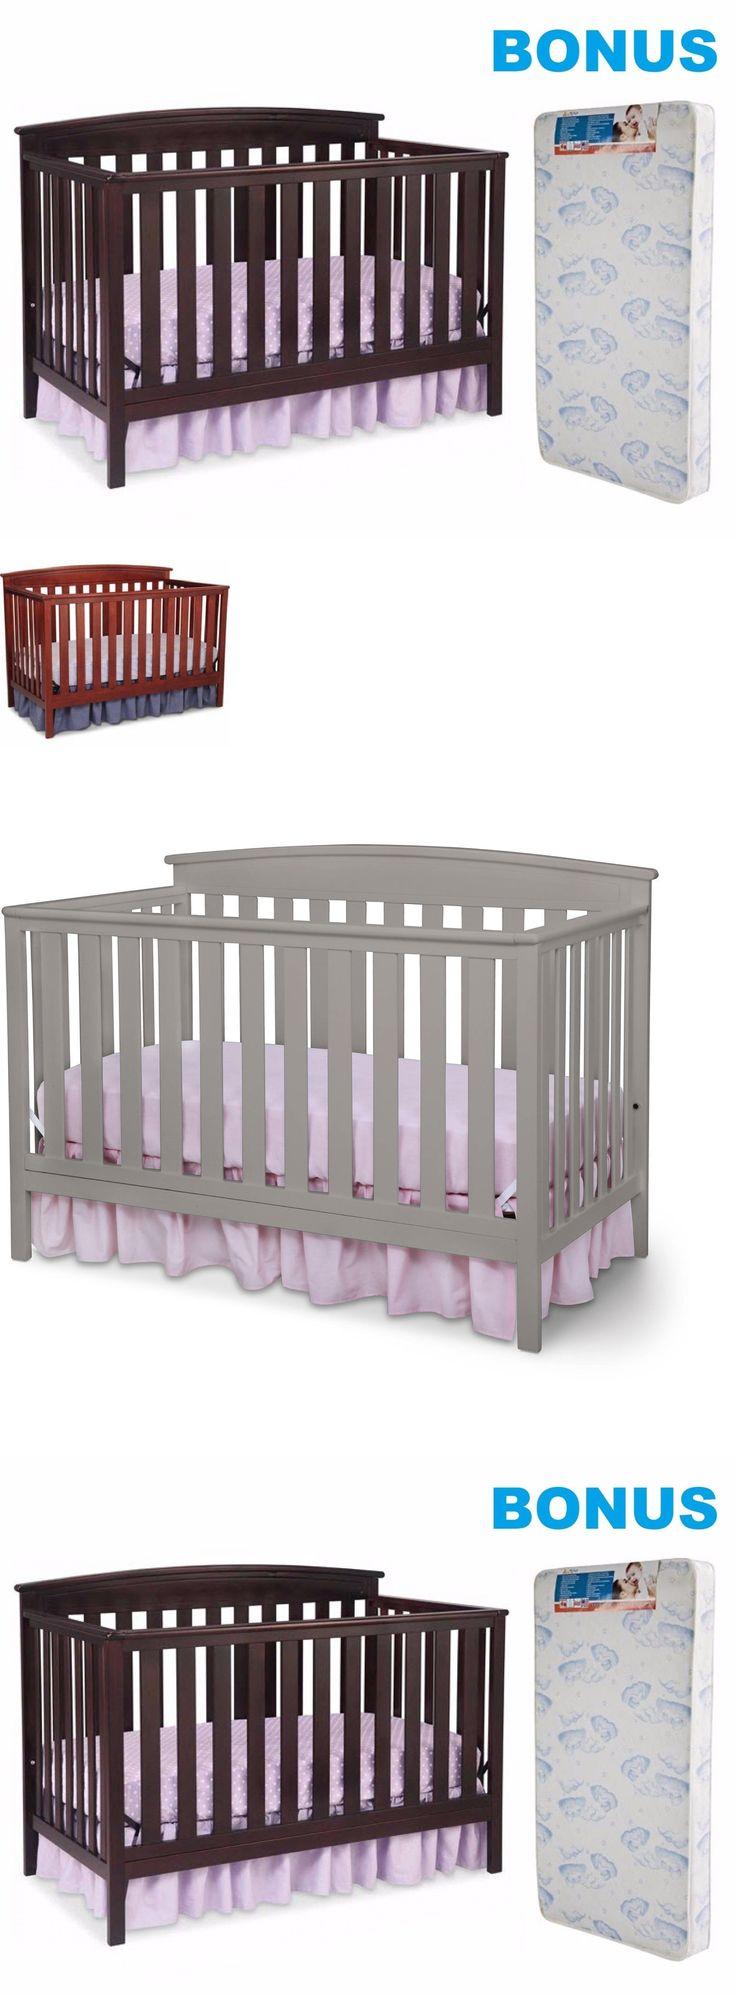 Cribs 2985 Convertible Crib With Bonus Mattress 4 In 1 Baby Children Nursery